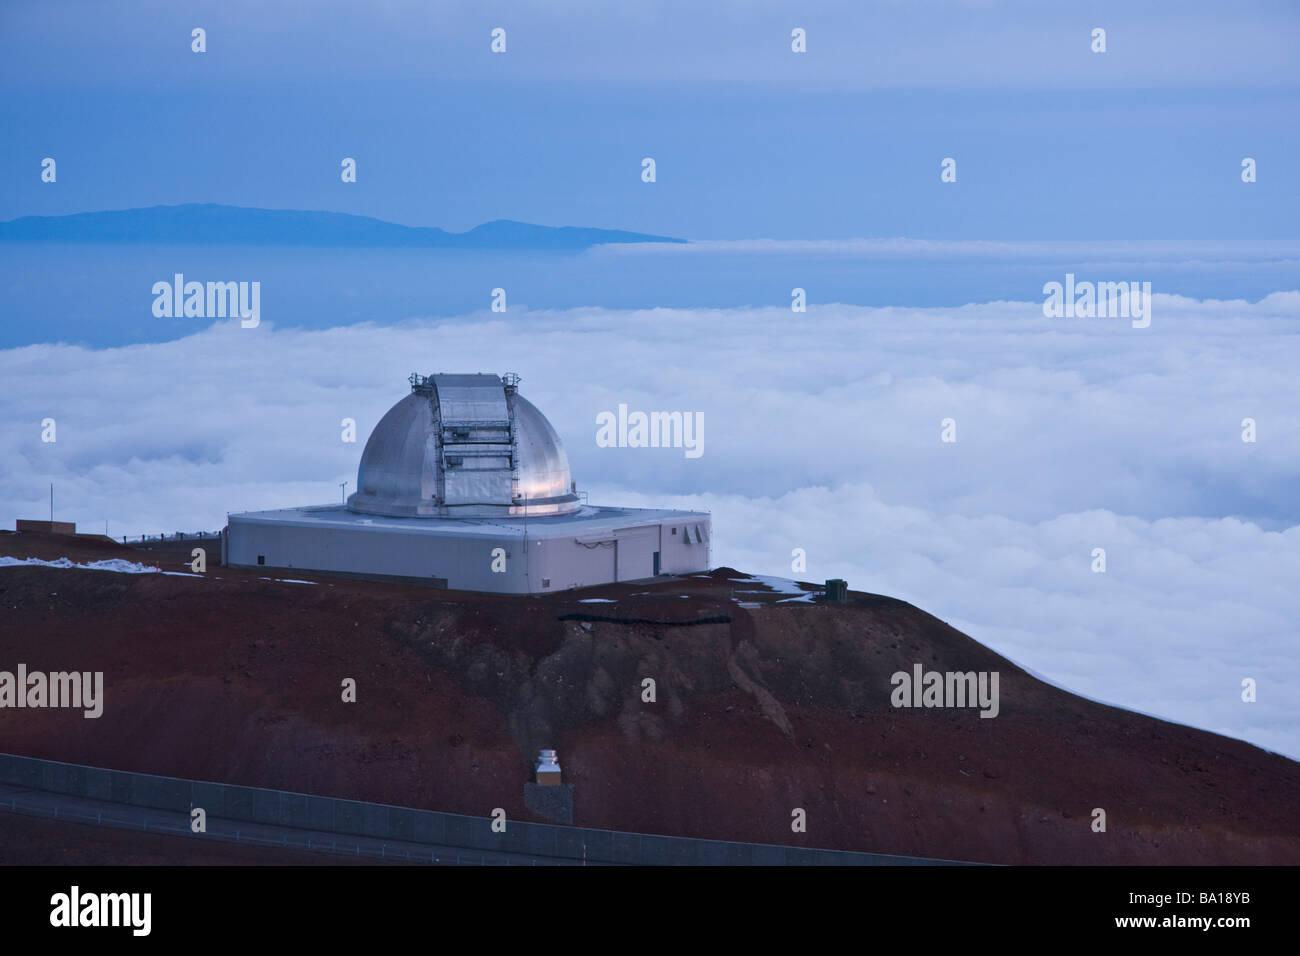 NASA Infrared Telescope Facility - Mauna Kea, Big Island, Hawaii, USA - Stock Image